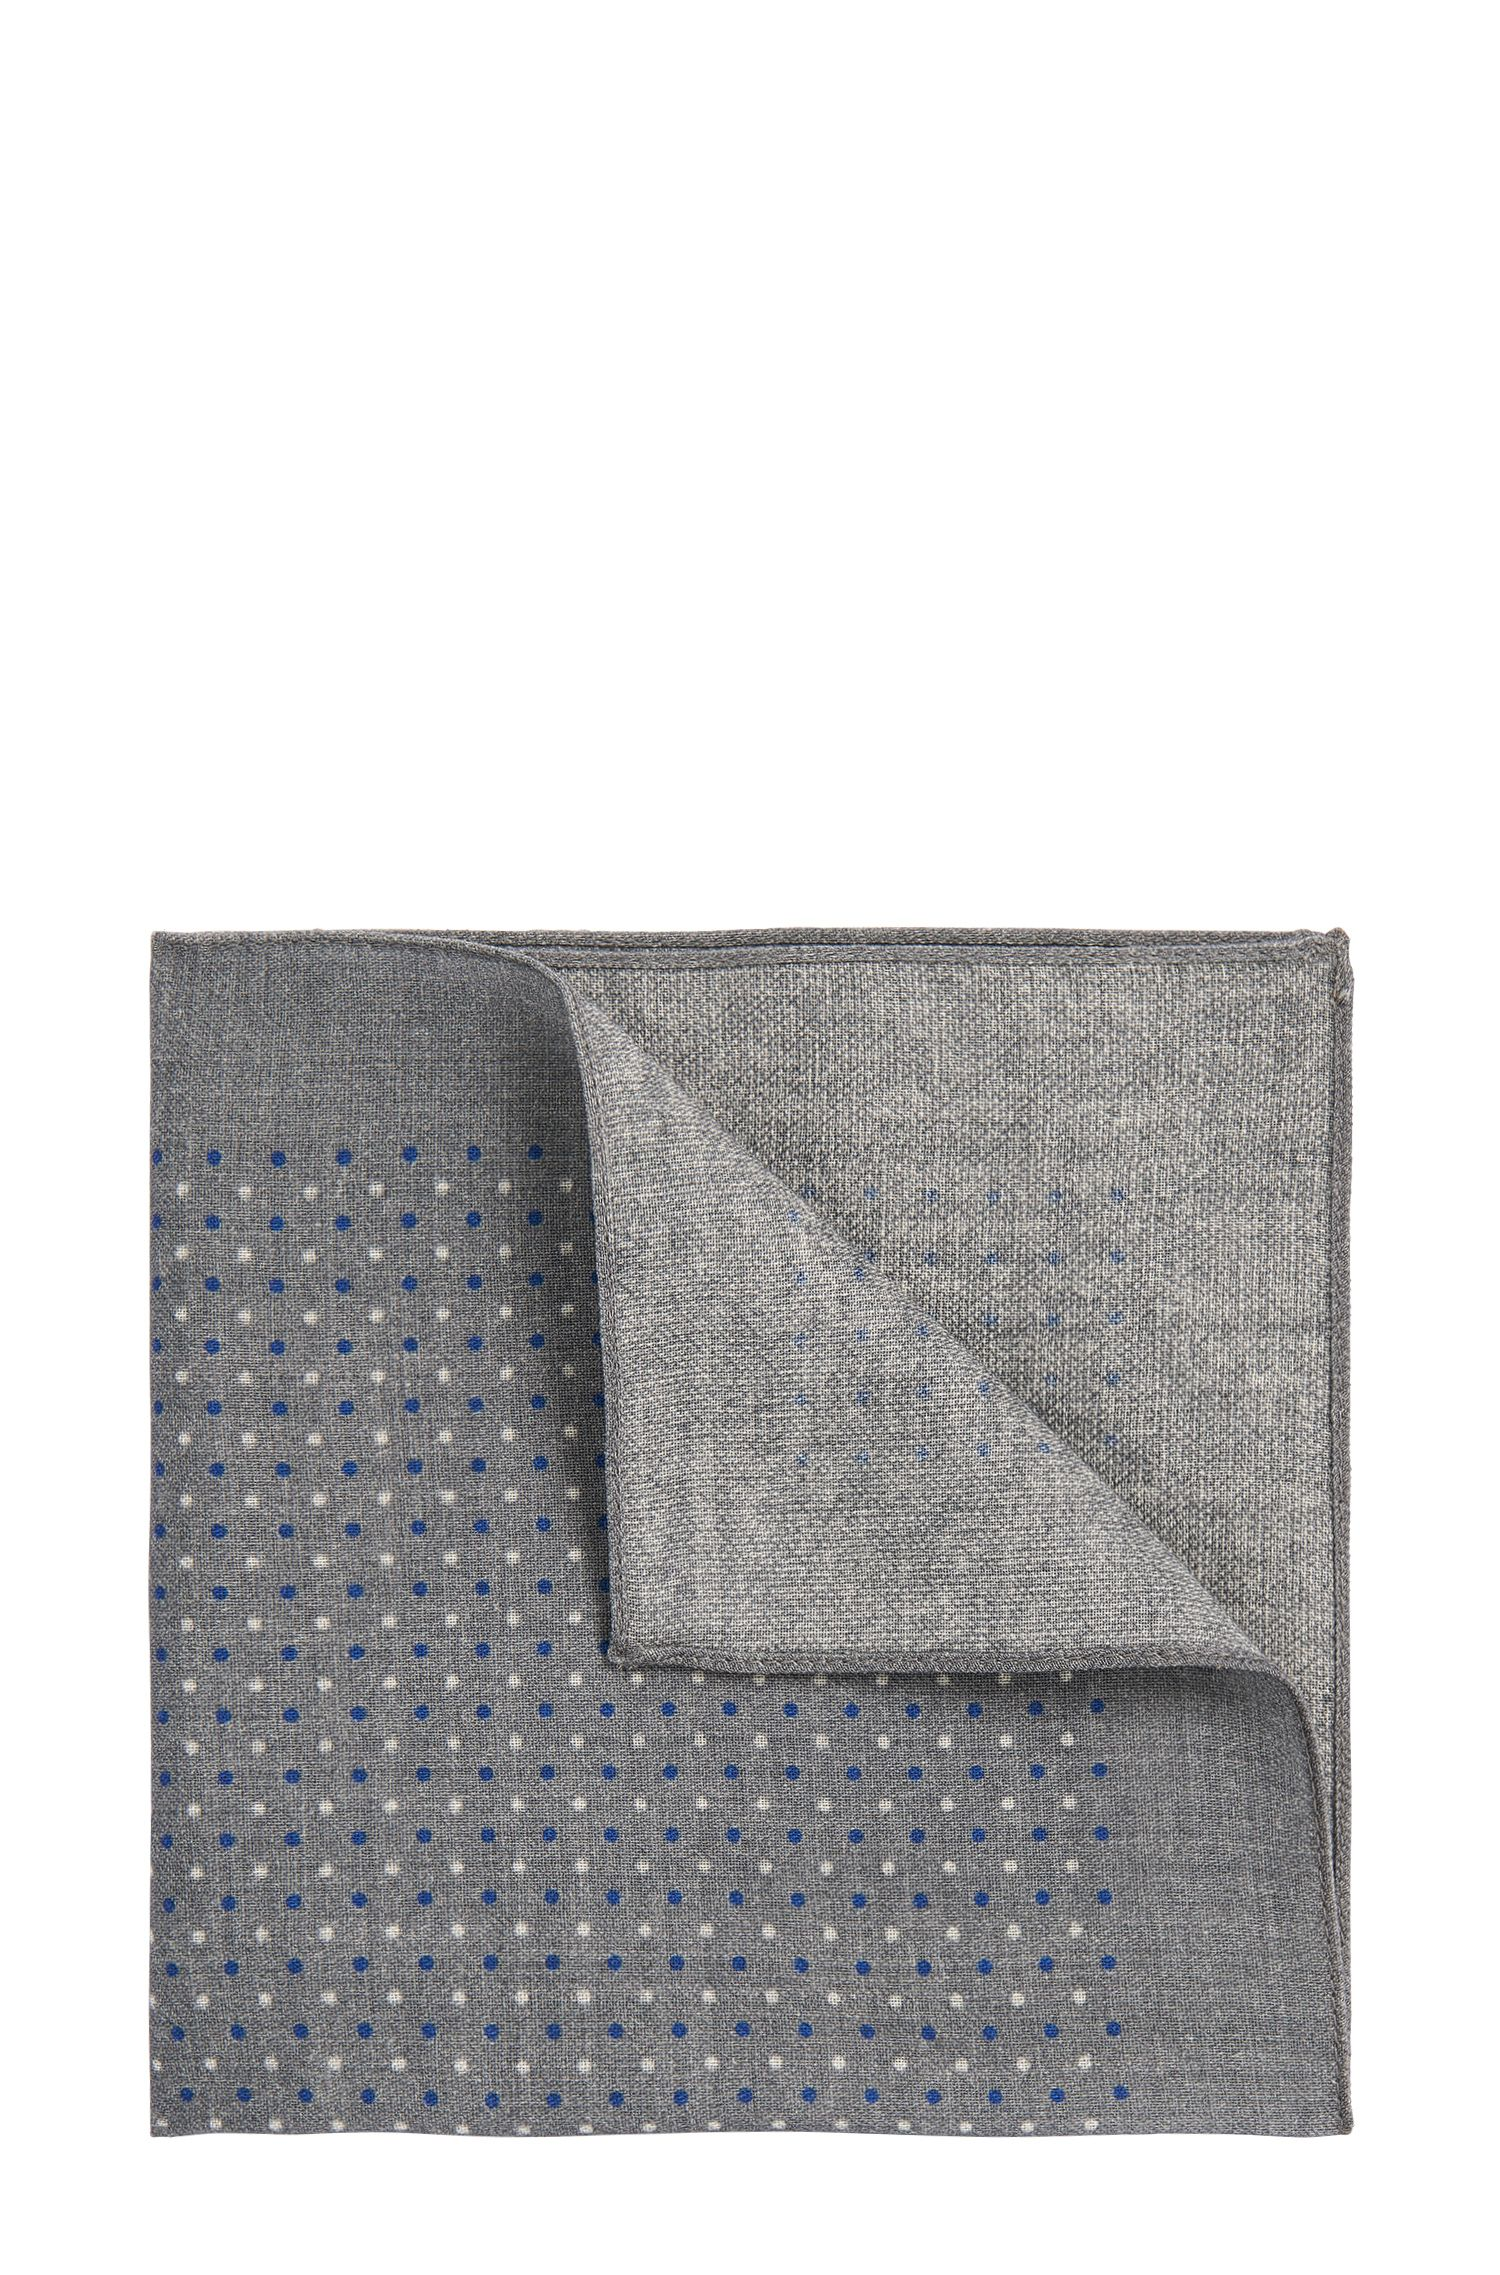 'Pocket sq. cm 33x33' | Wool Patterned Pocket Square